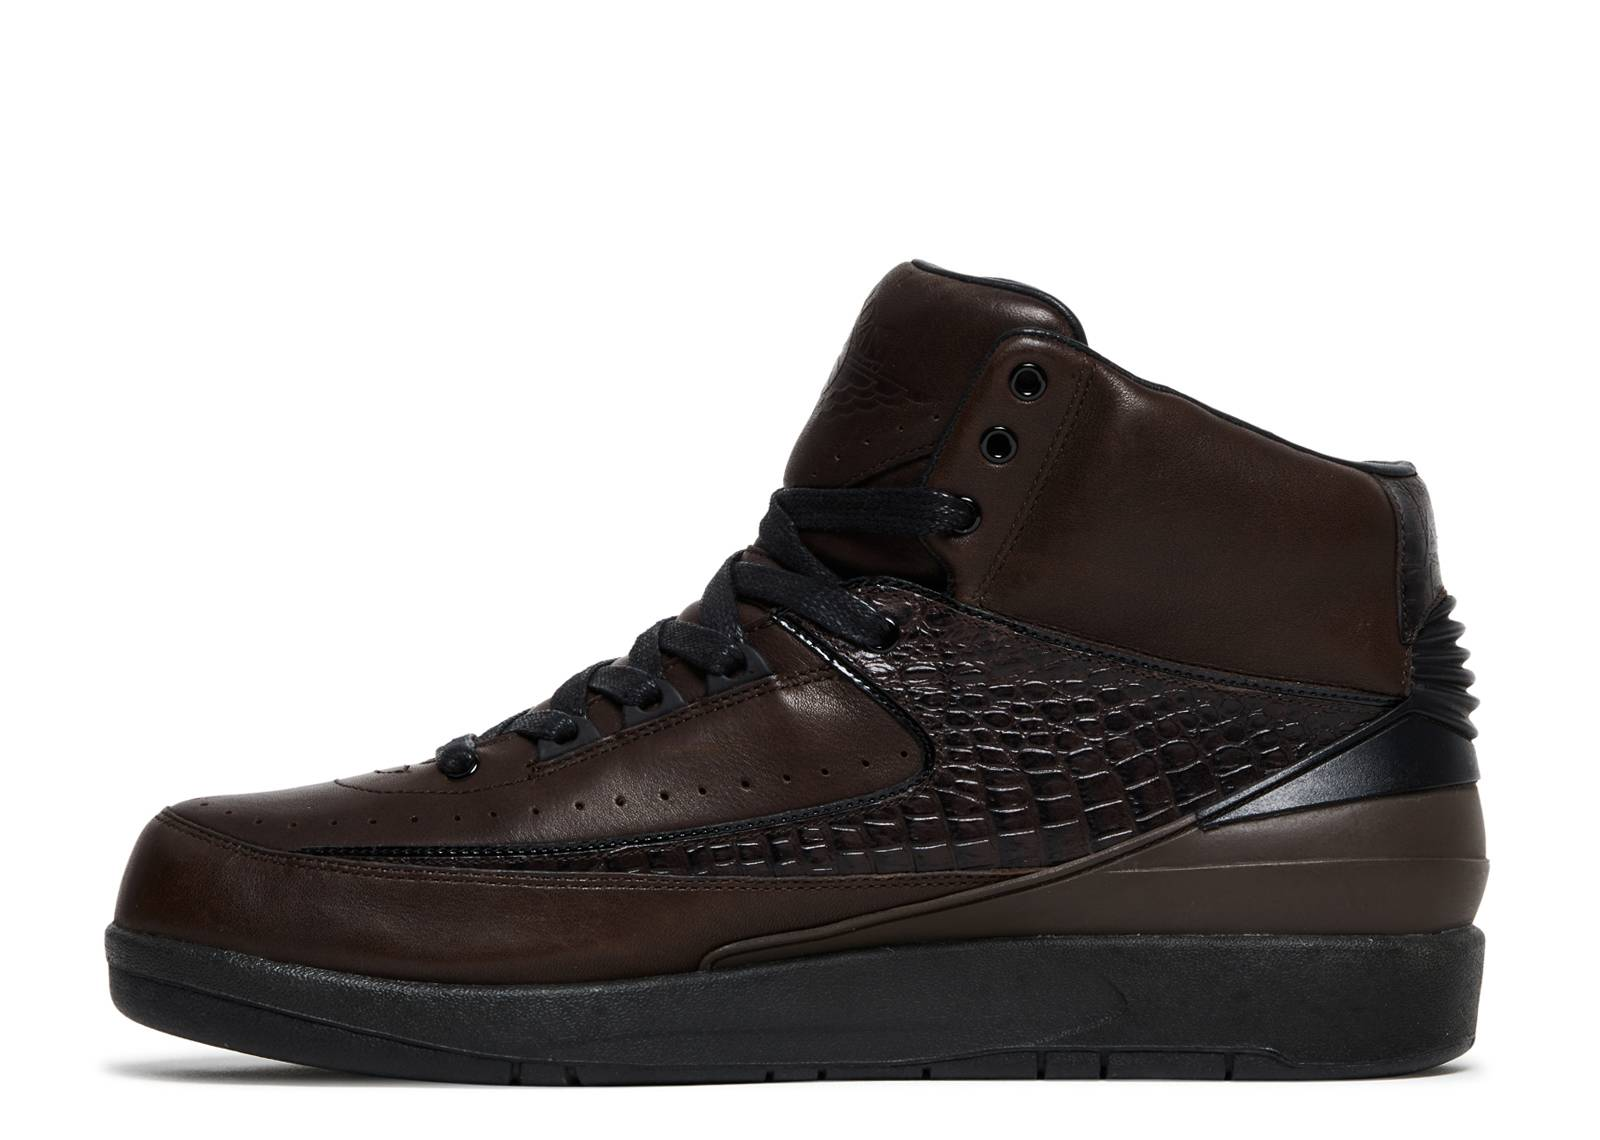 sale retailer 3401a 6f6e2 Air Jordan 2 Retro Premio